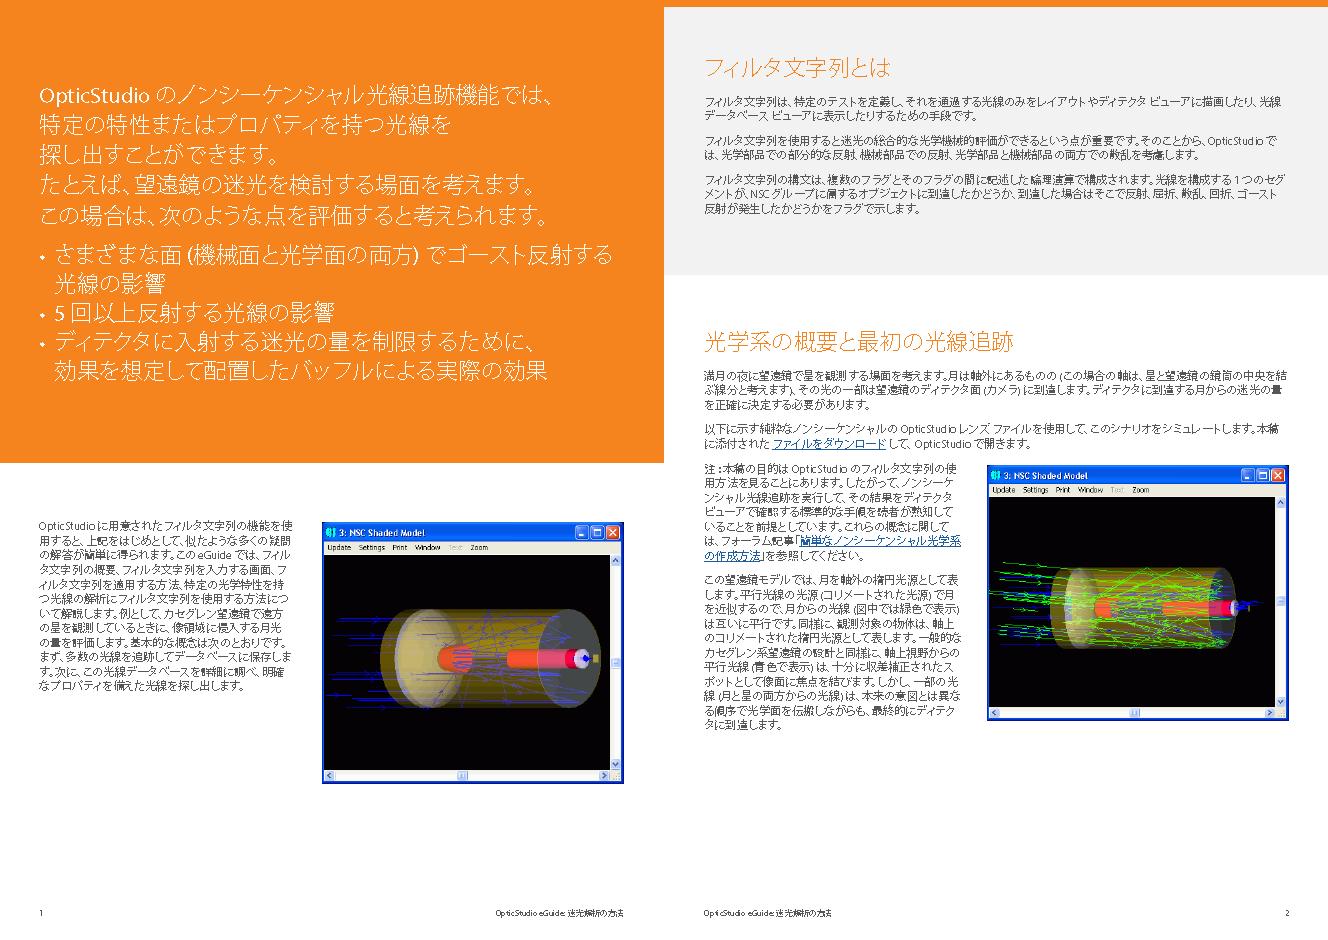 迷光解析の方法 Sneak Preview